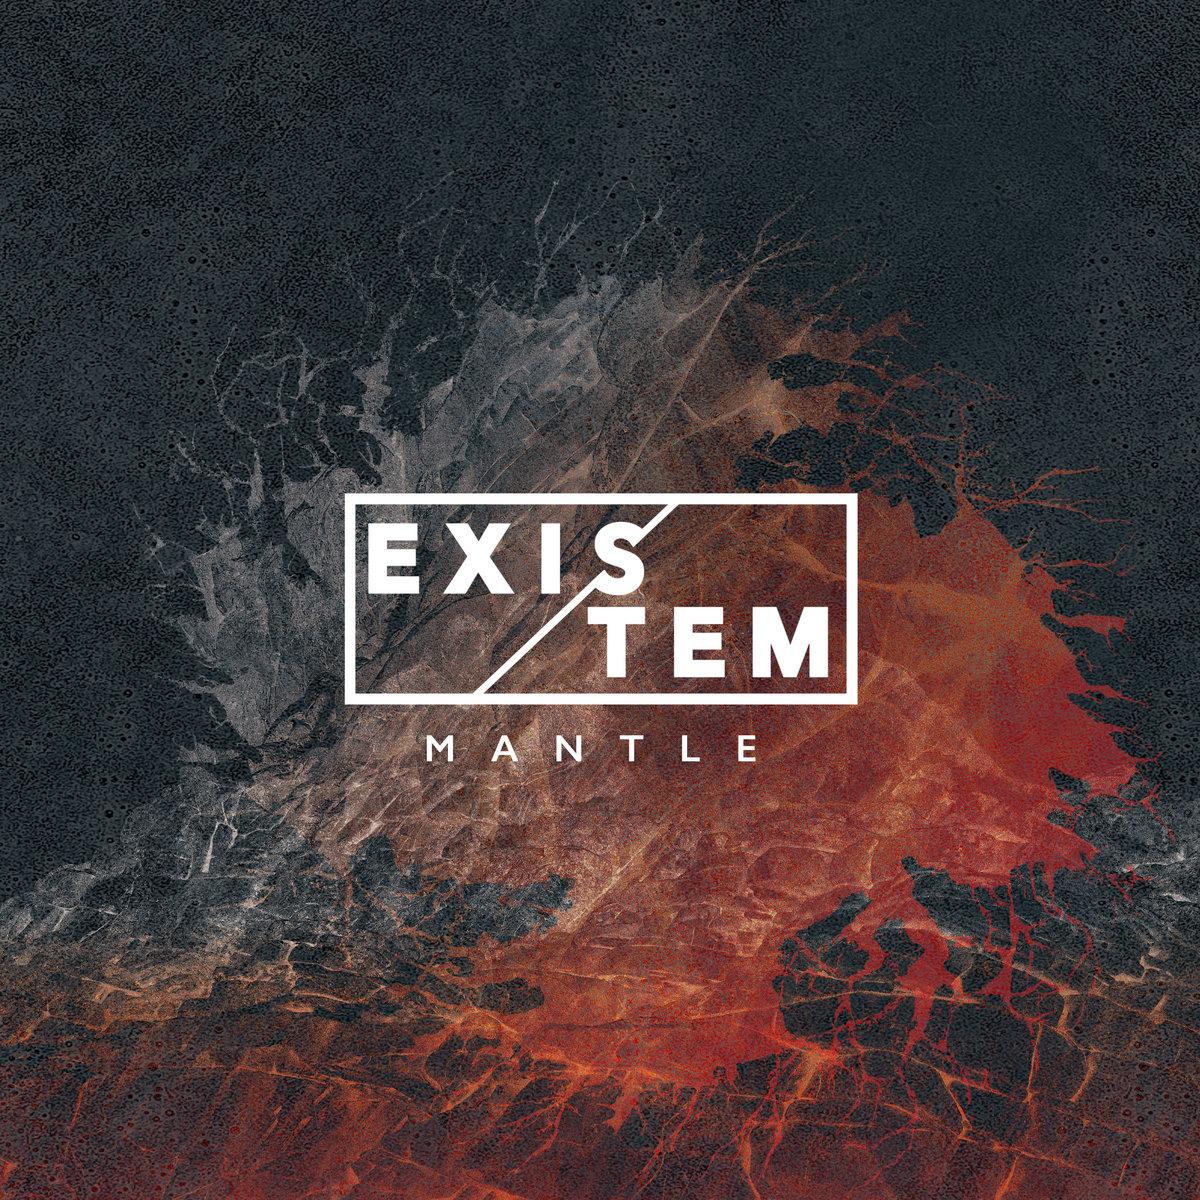 https://existem.bandcamp.com/album/mantle